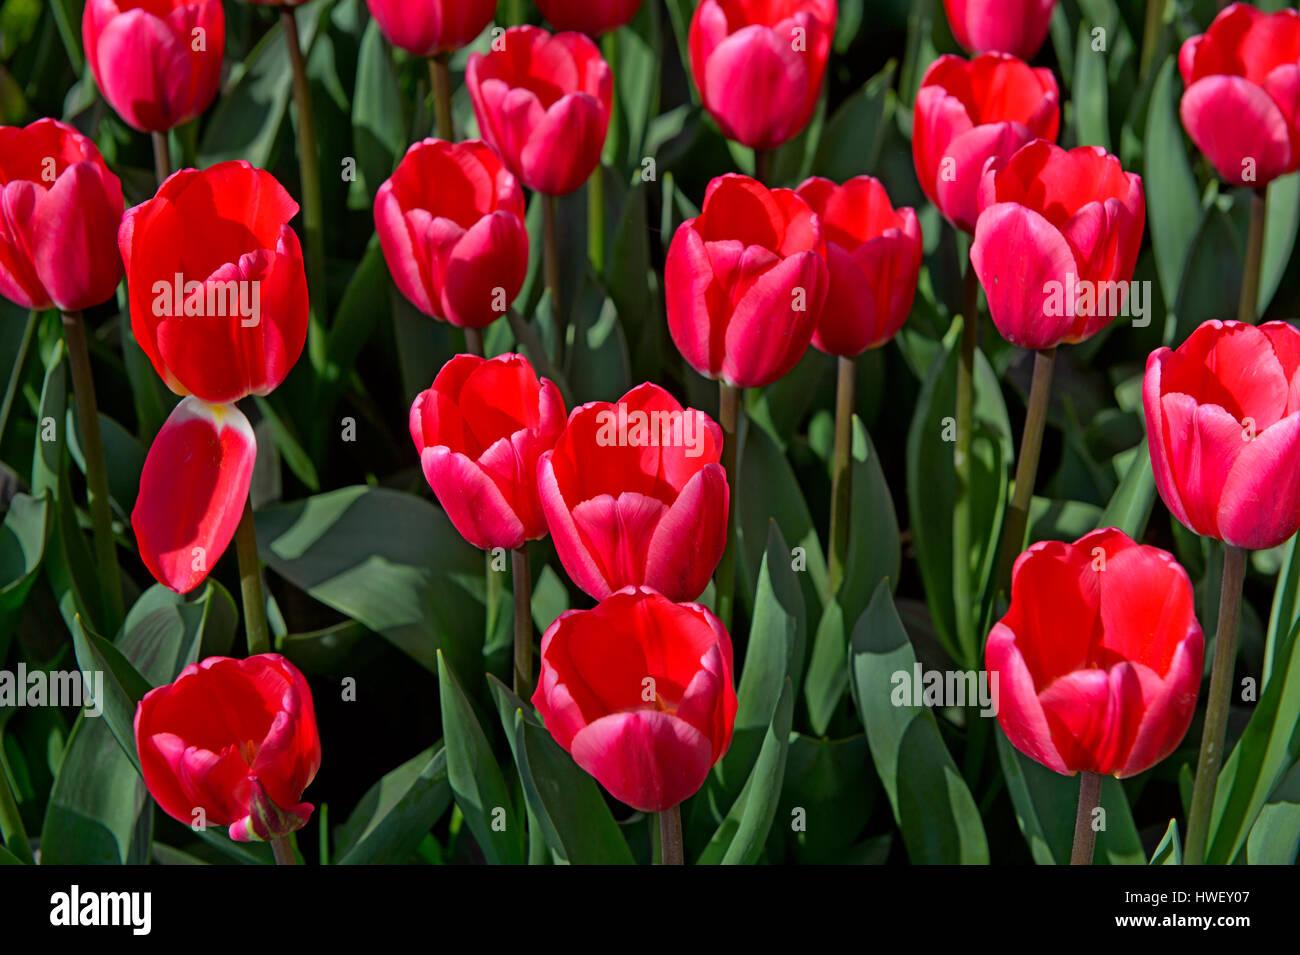 Plant Breeding Stock Photos & Plant Breeding Stock Images - Alamy